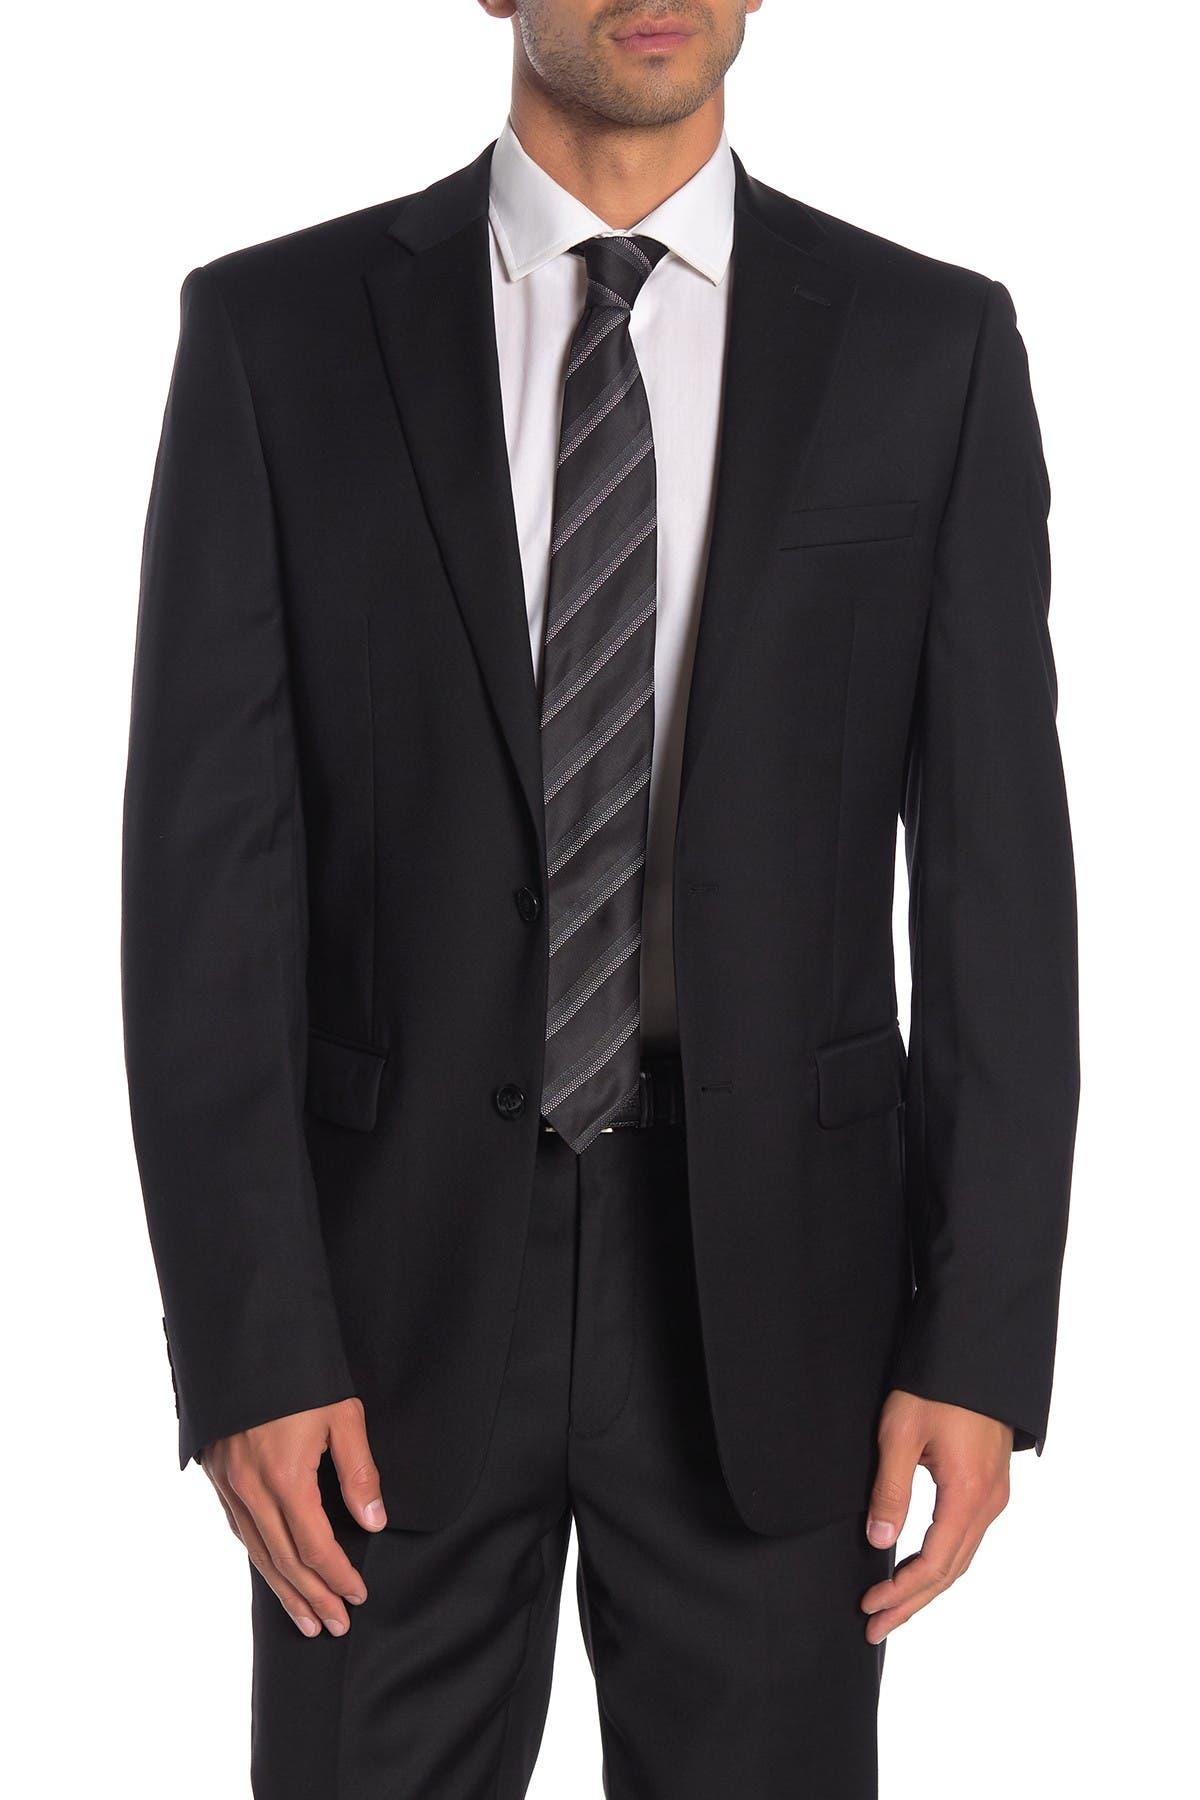 Image of Calvin Klein Solid Black Suit Suit Separates Jacket